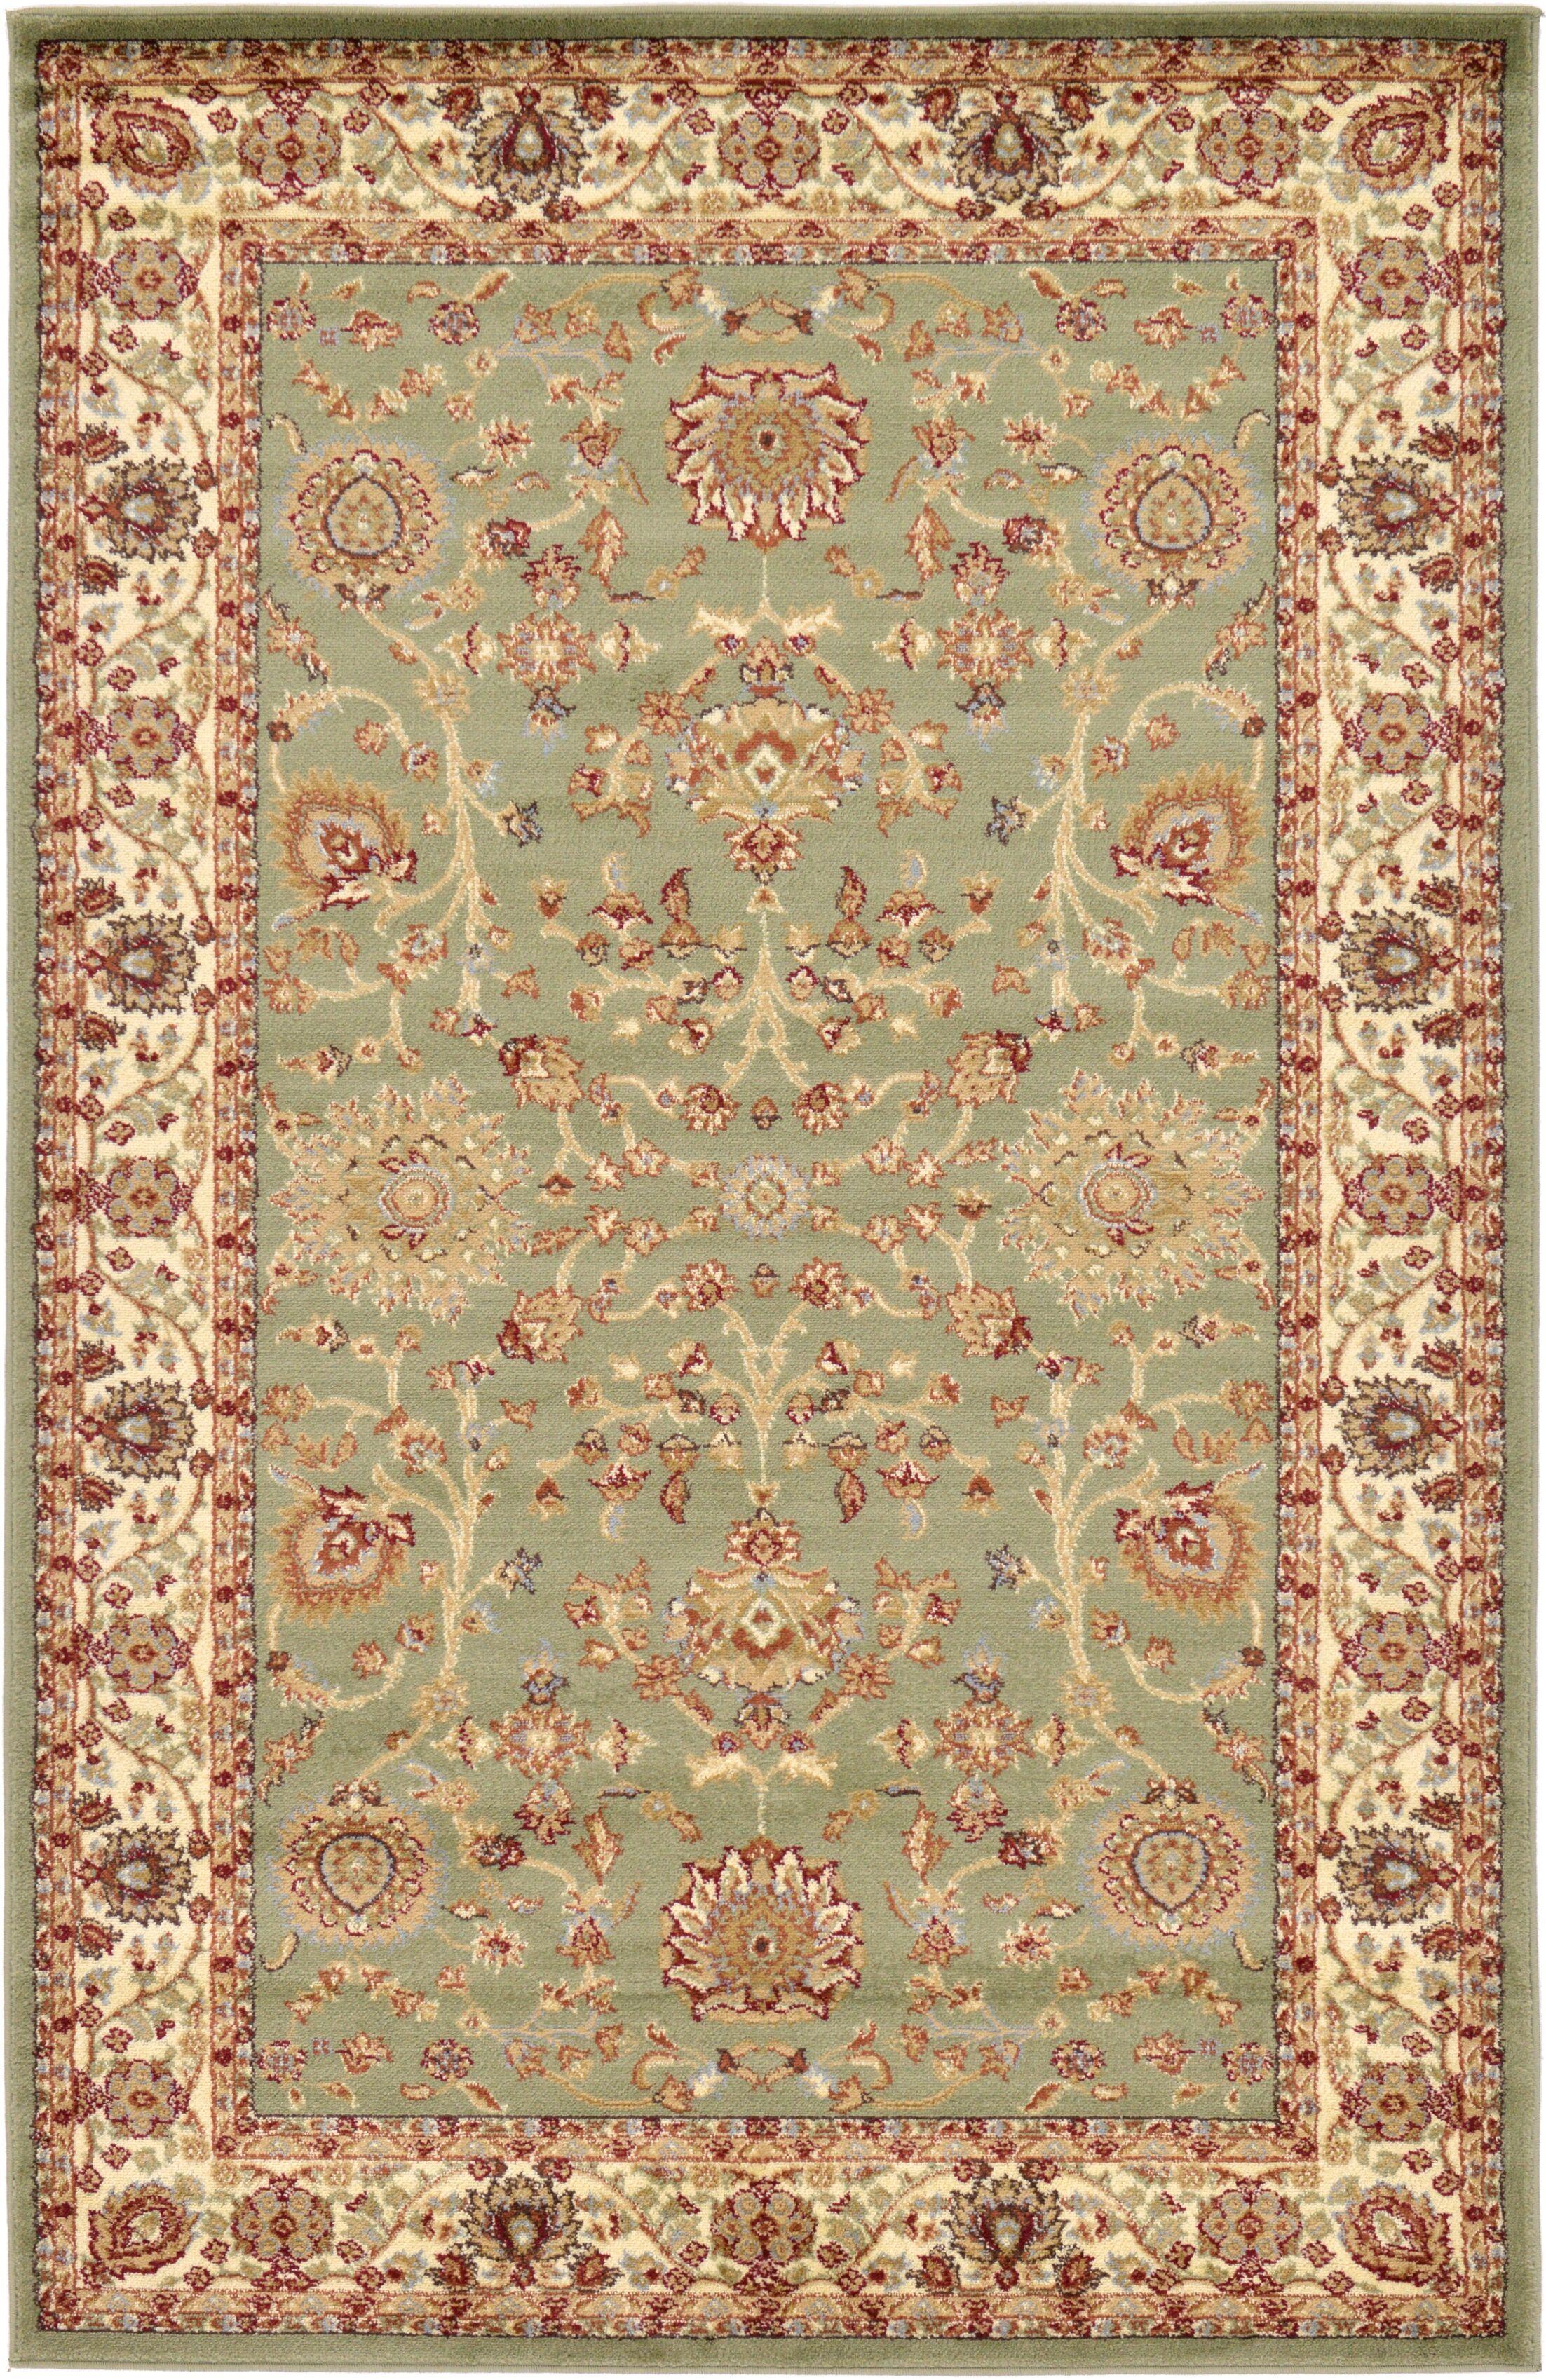 Fairmount Light Green Oriental Area Rug Rug Size: Rectangle 5.1' x 8'